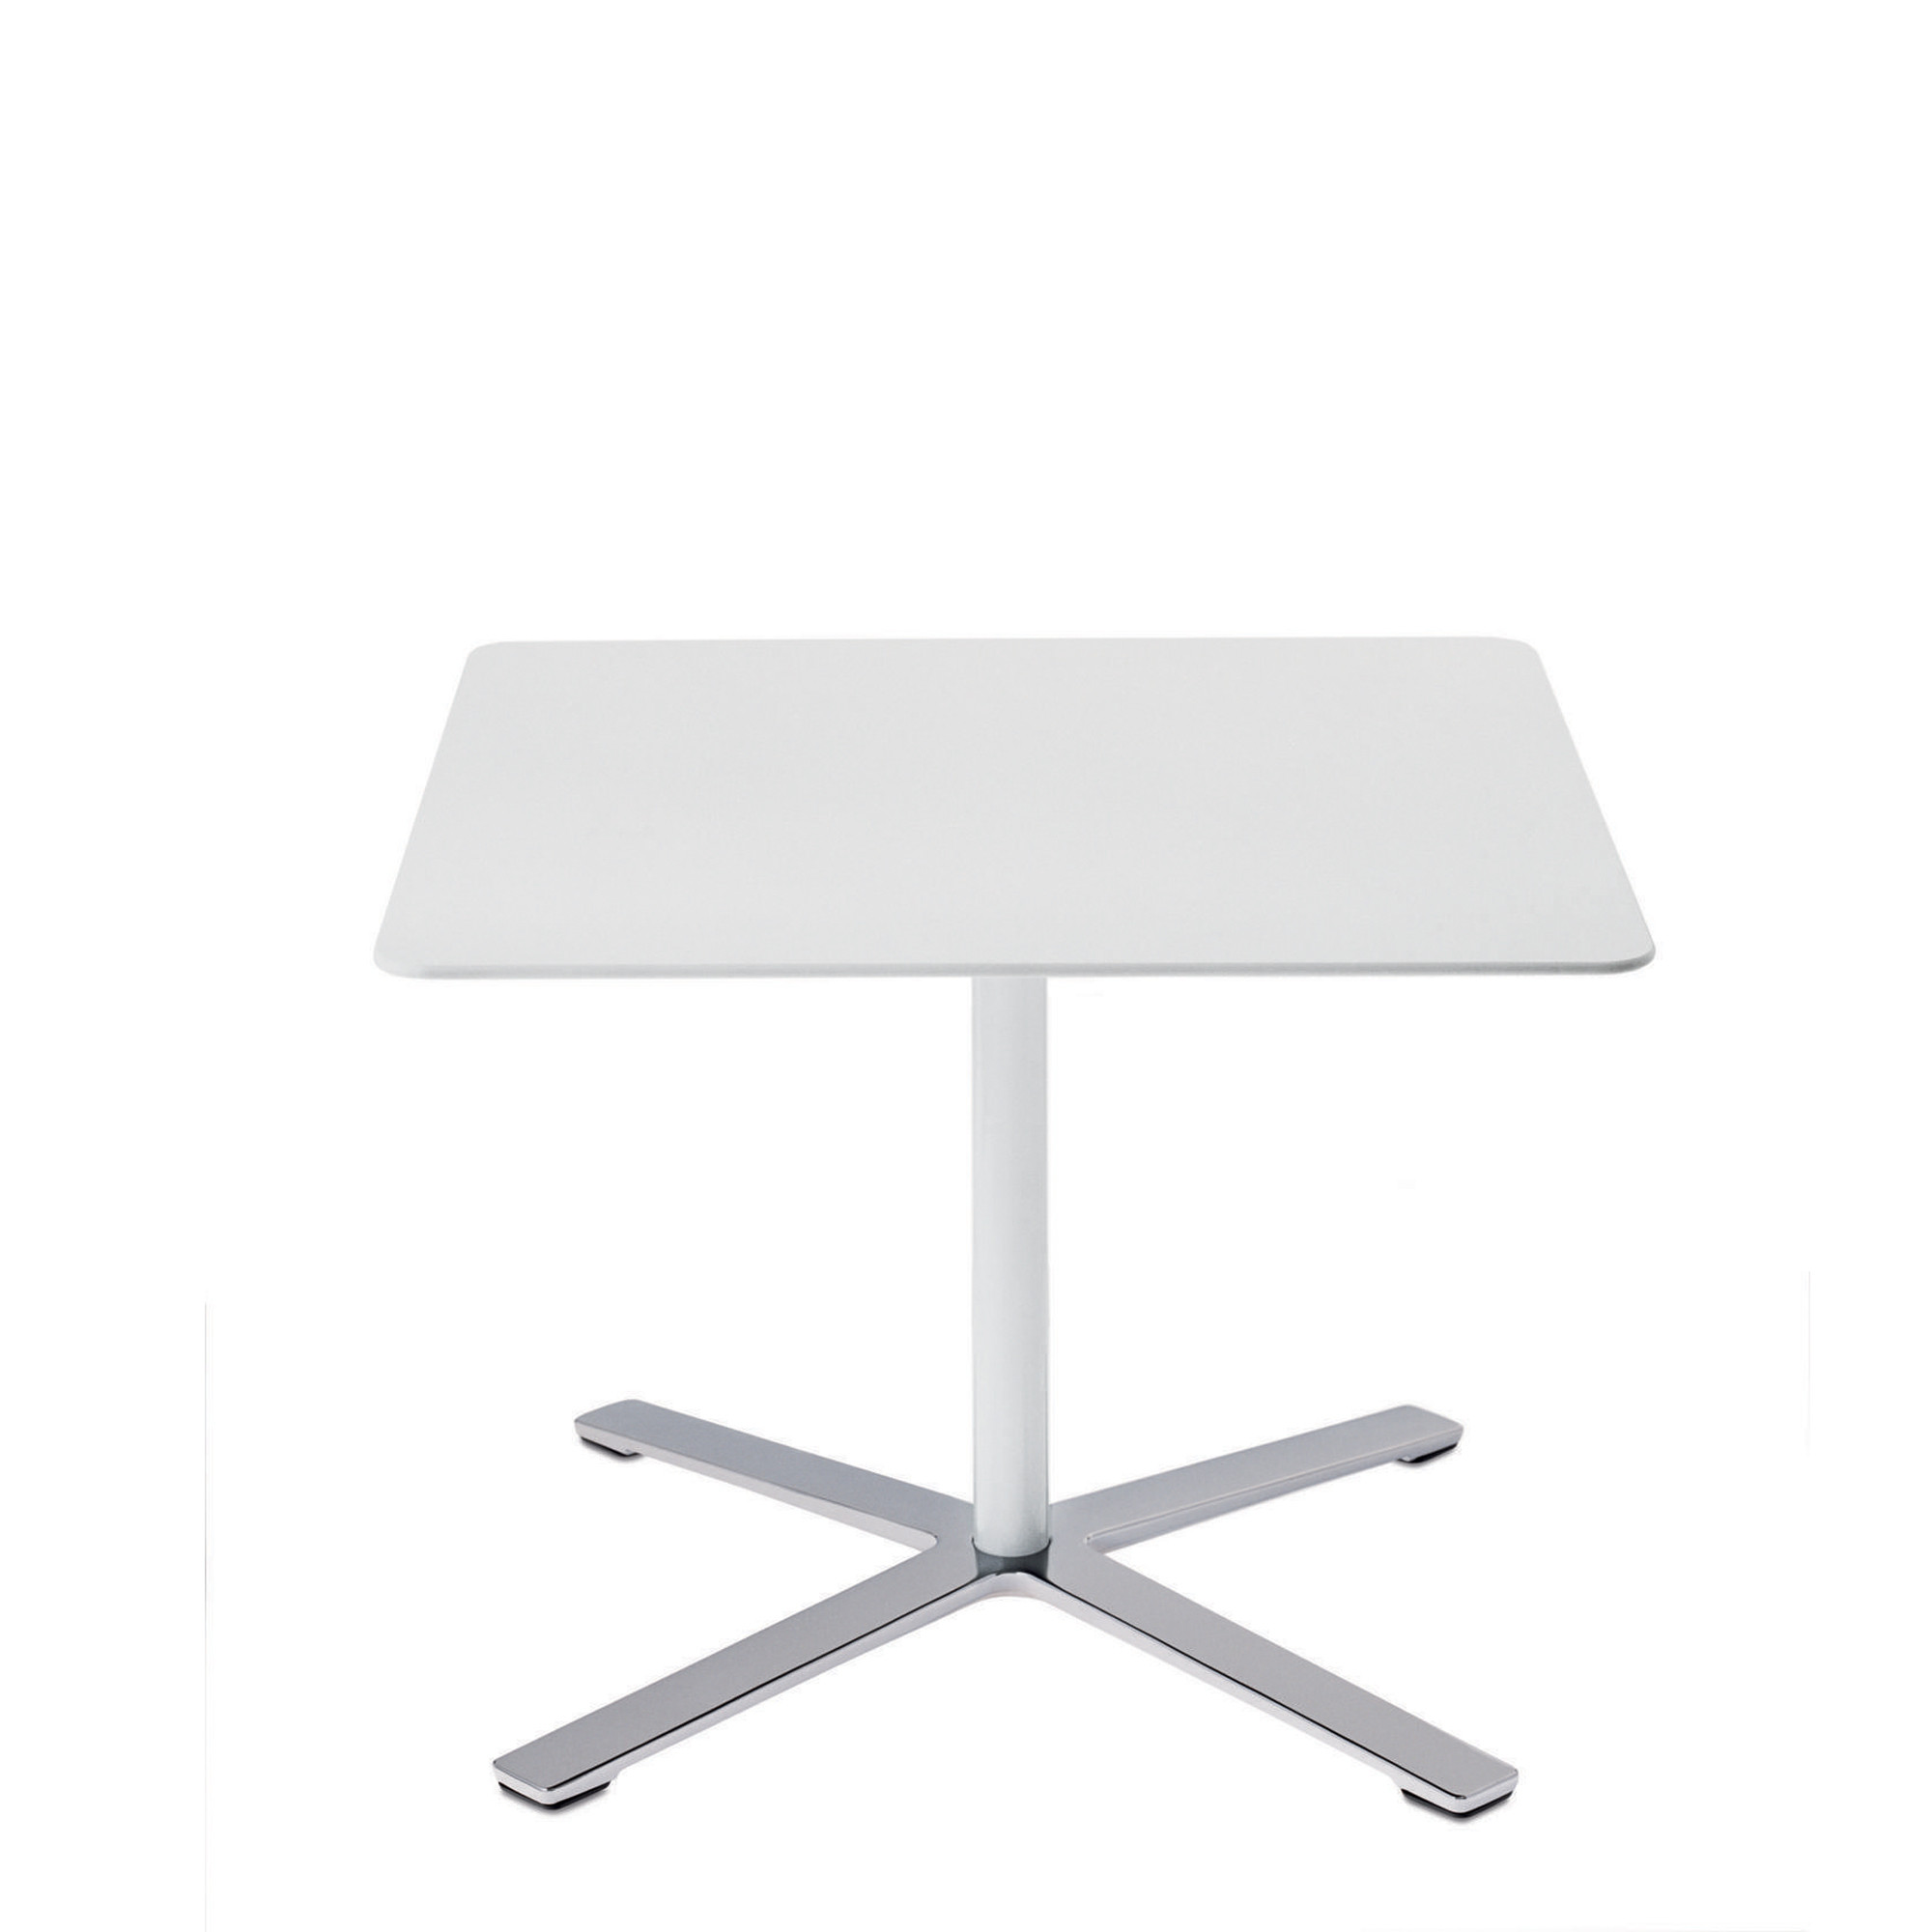 Aline Square Pedestal Table